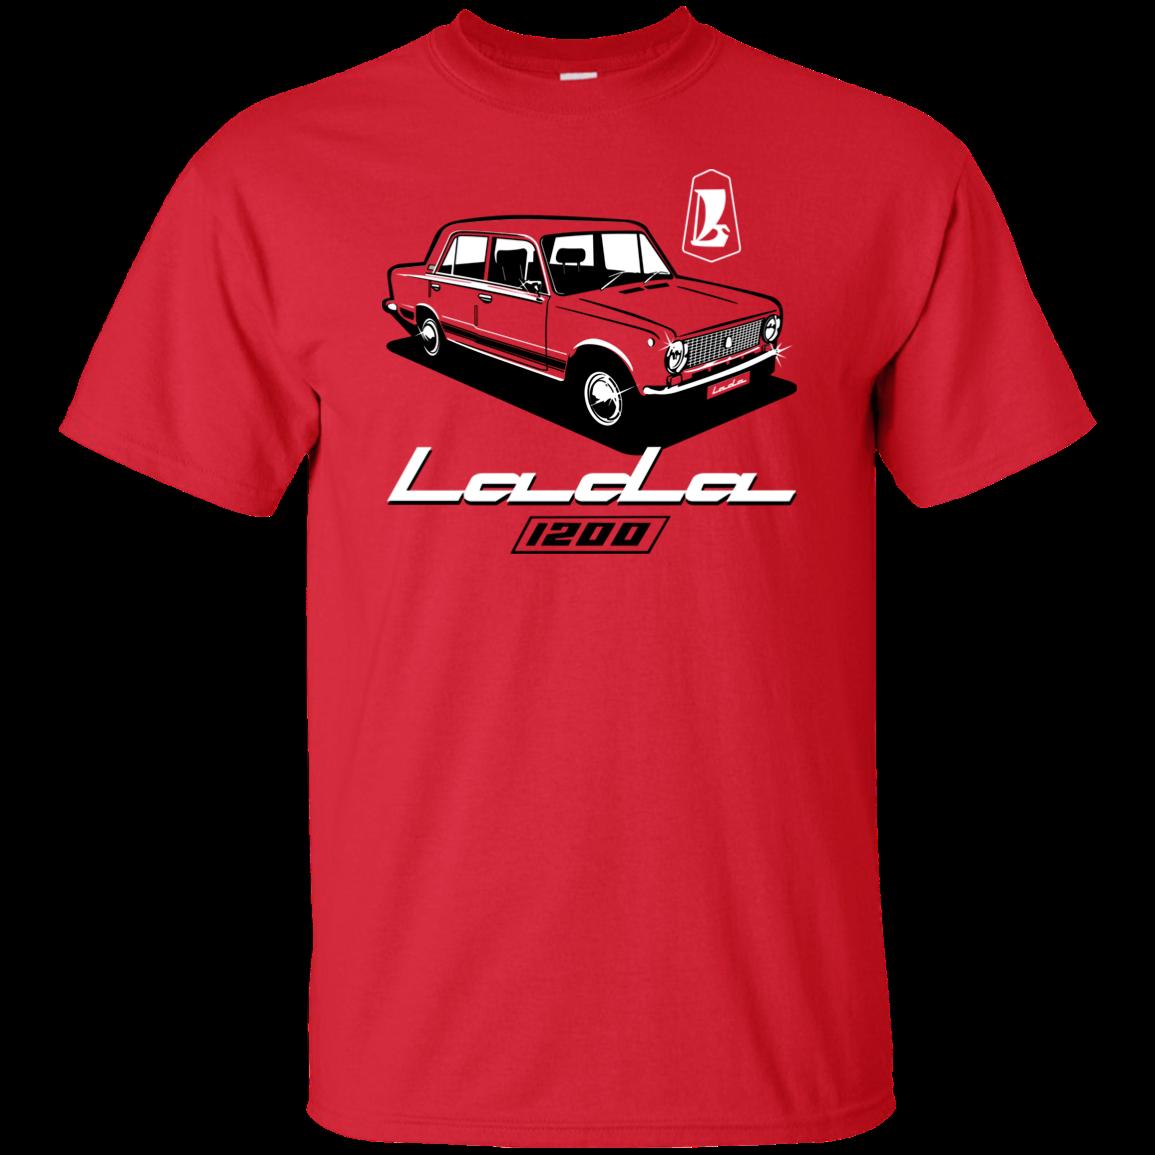 Lada, 1200, Soviet Union, Car, CCCP, Kopeyka, USSR, VAZ-2101, T-shirt